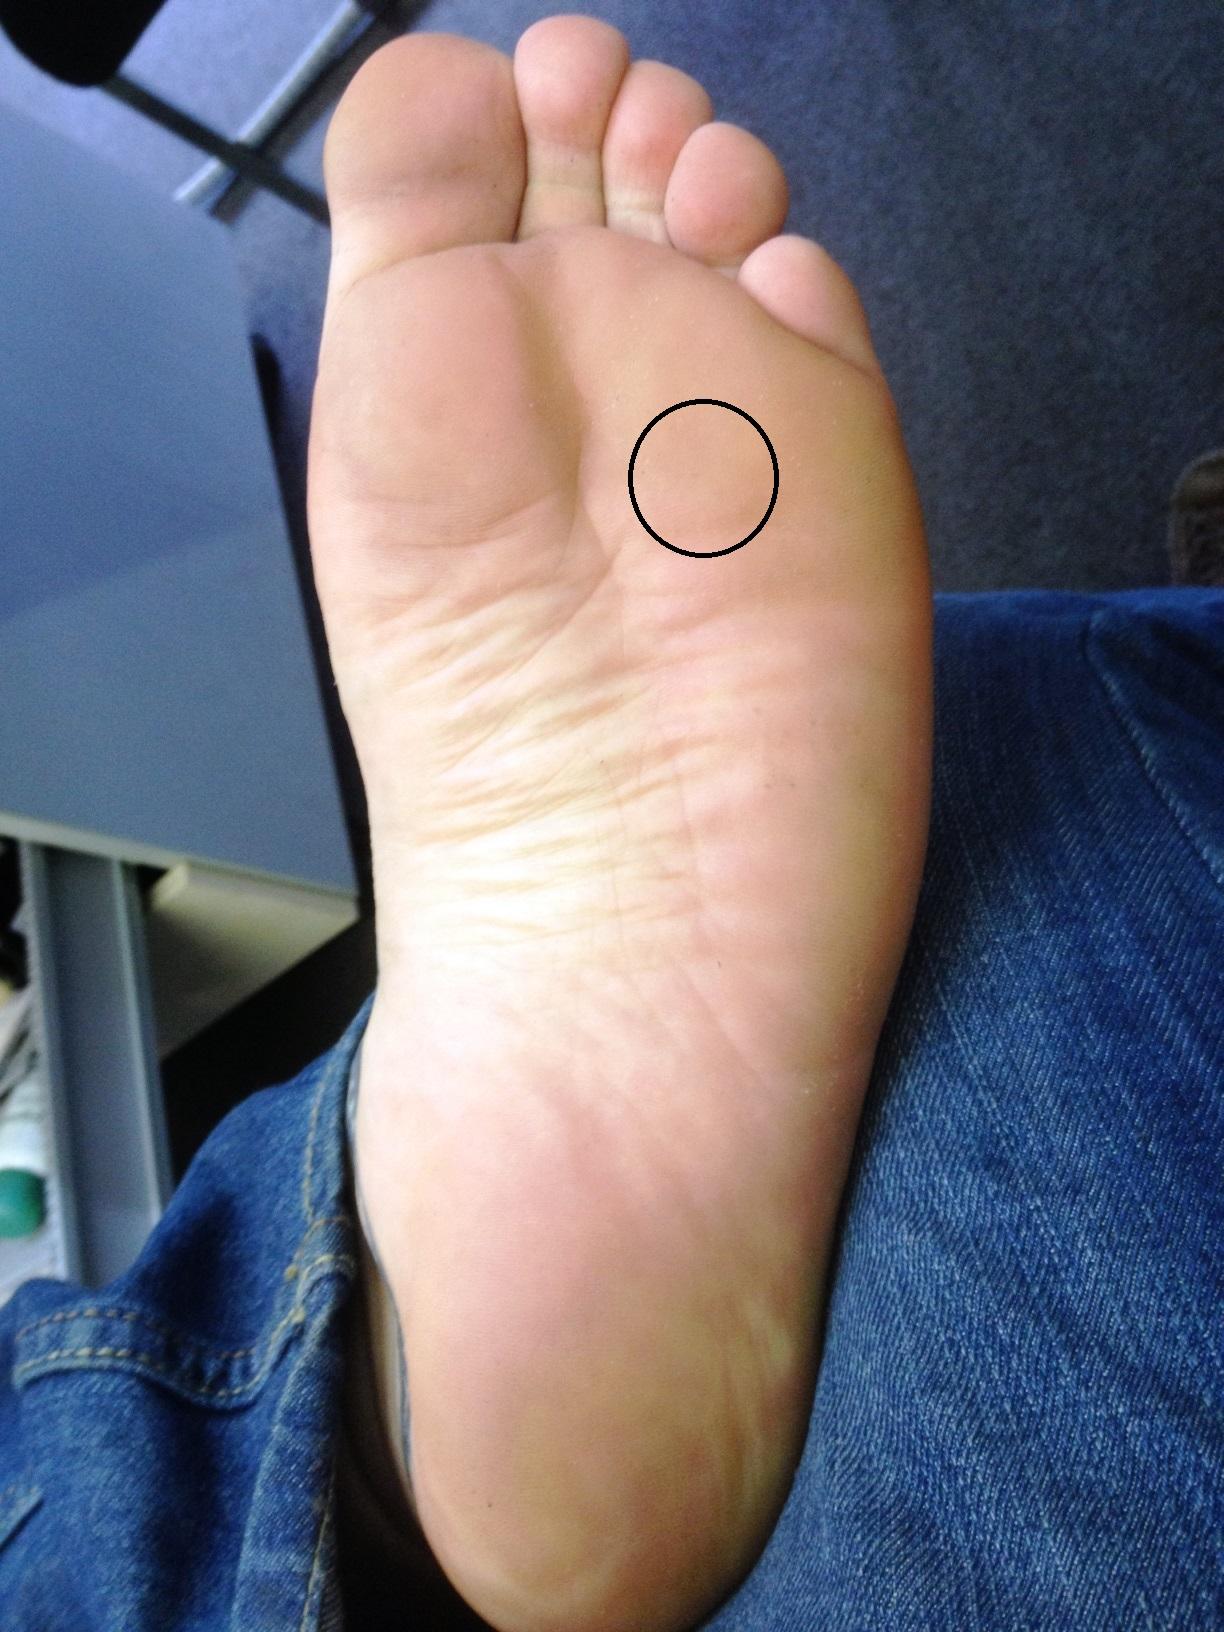 Schmerzen an meinem linken Fuss (Füße, barfuß, Sohle)